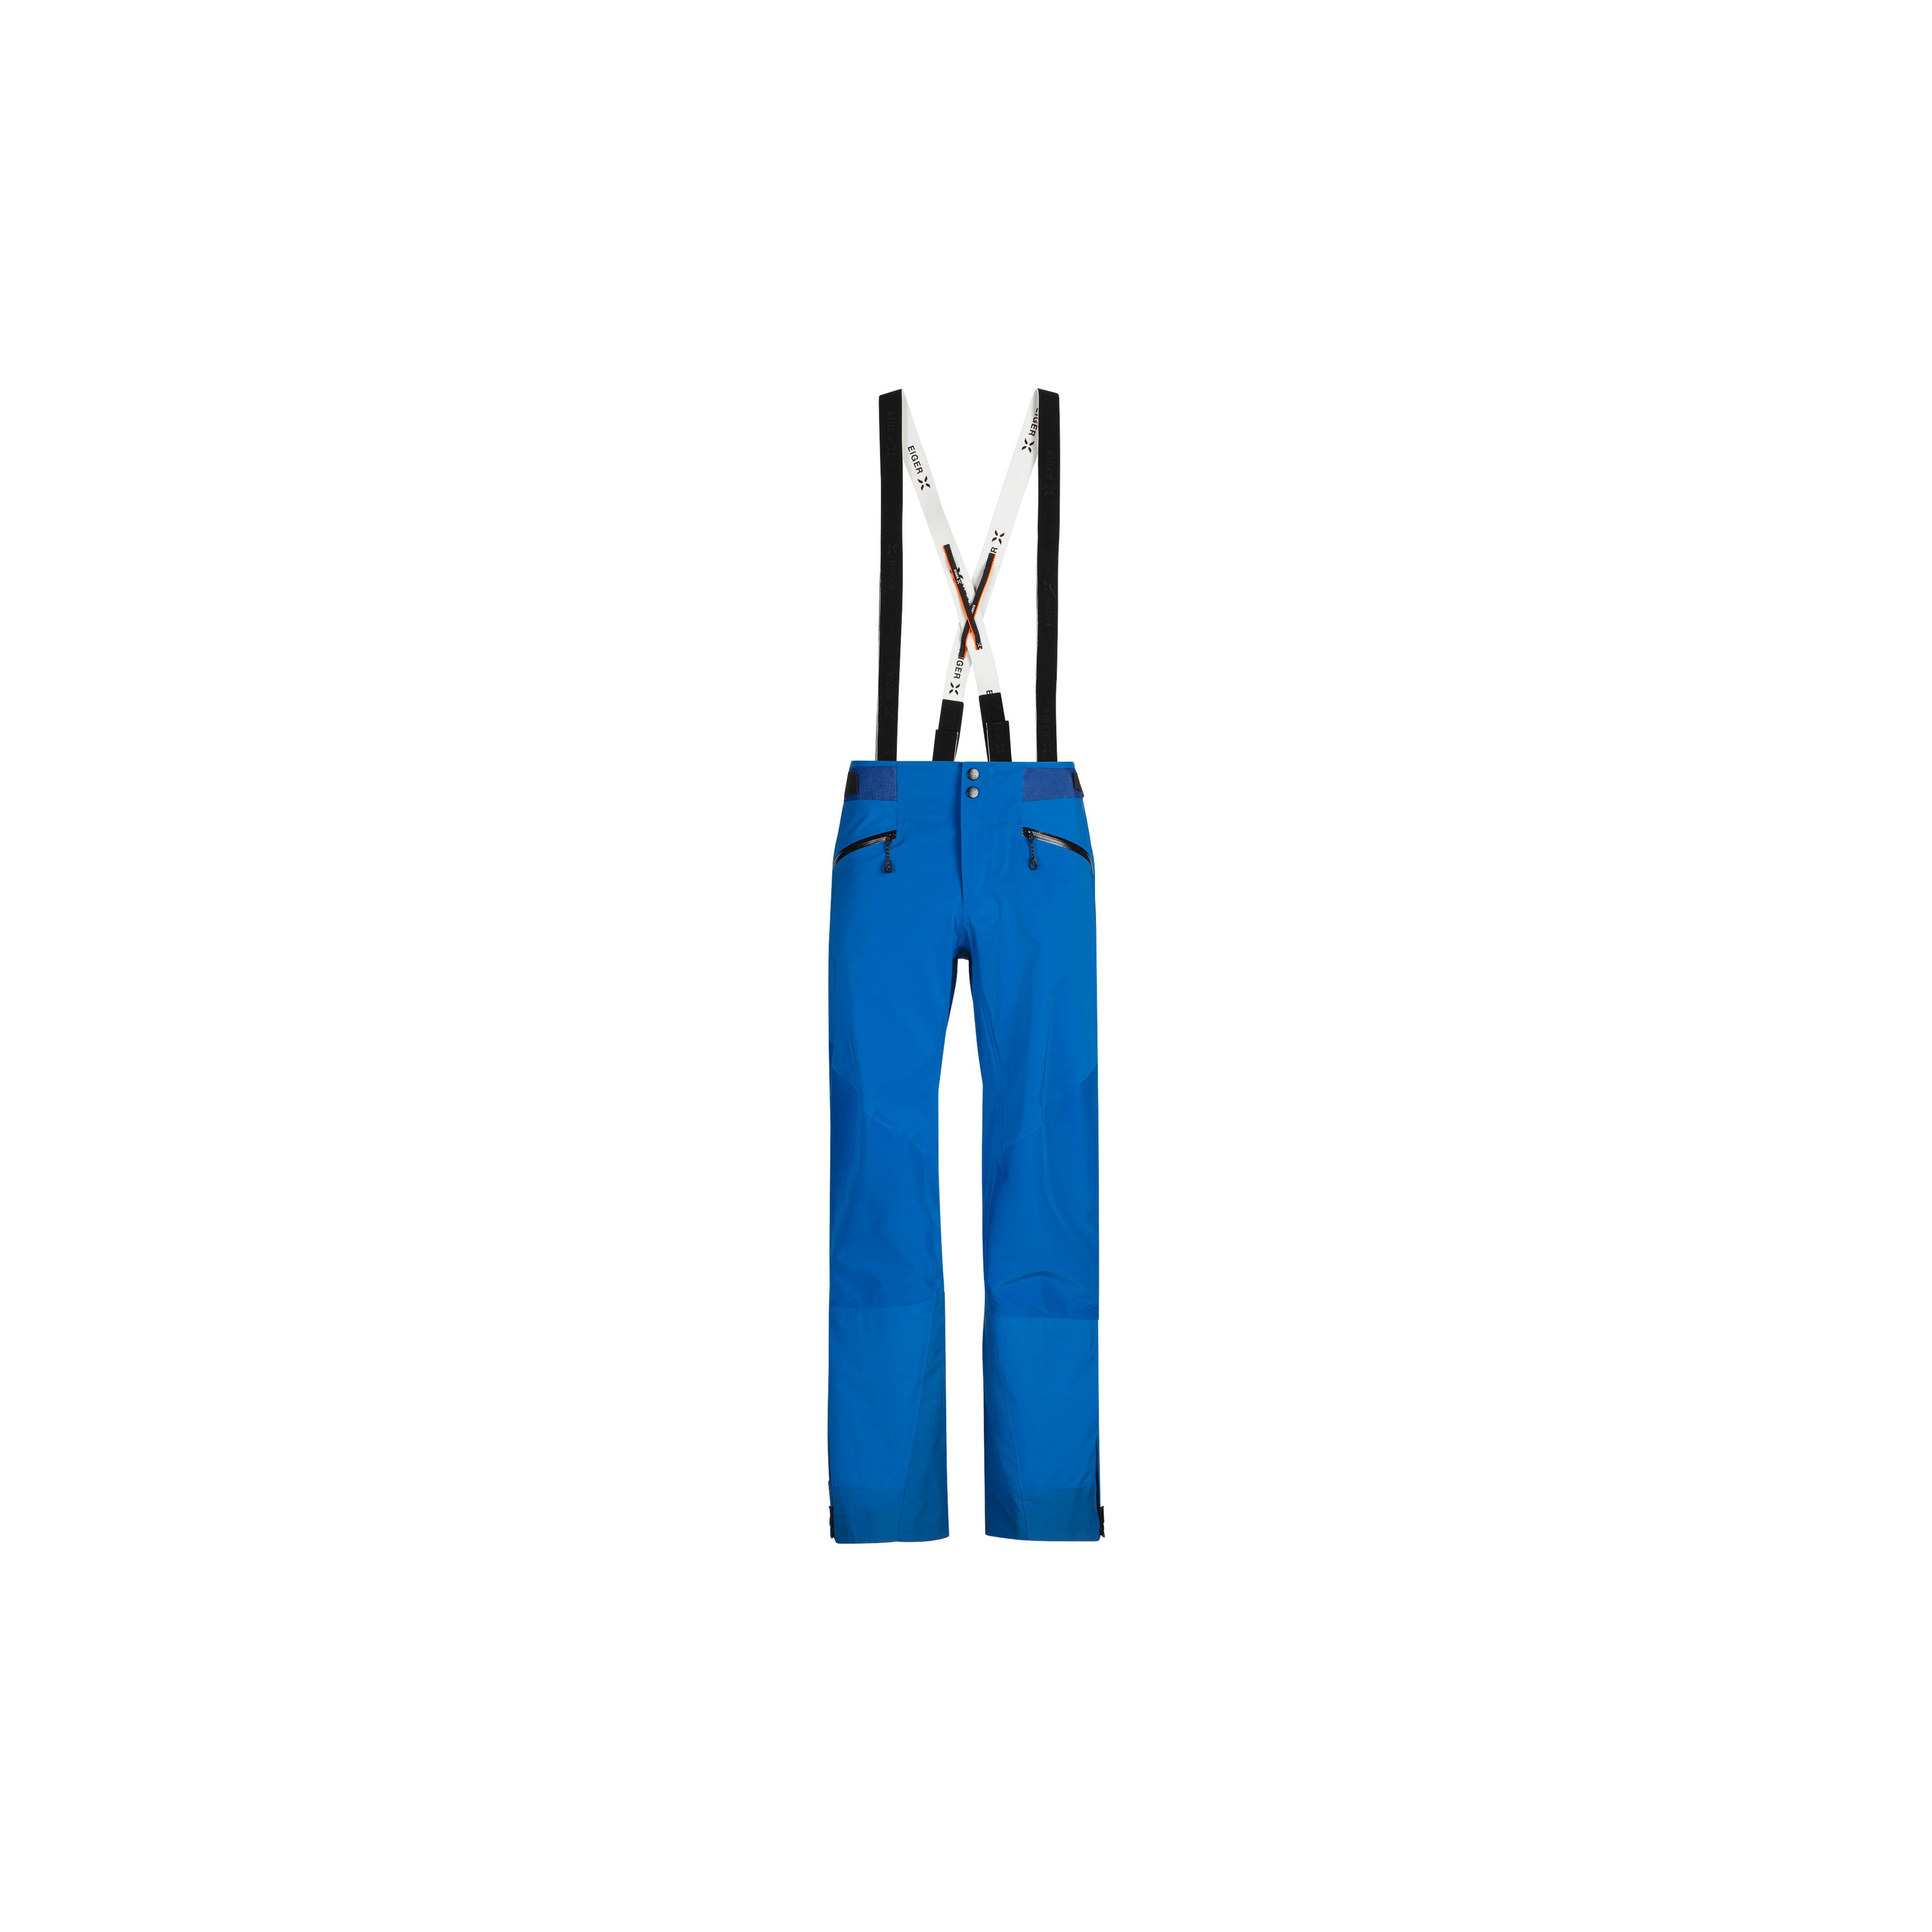 Nordwand Pro HS Pants Men - azurit, normal, UK 30 thumbnail